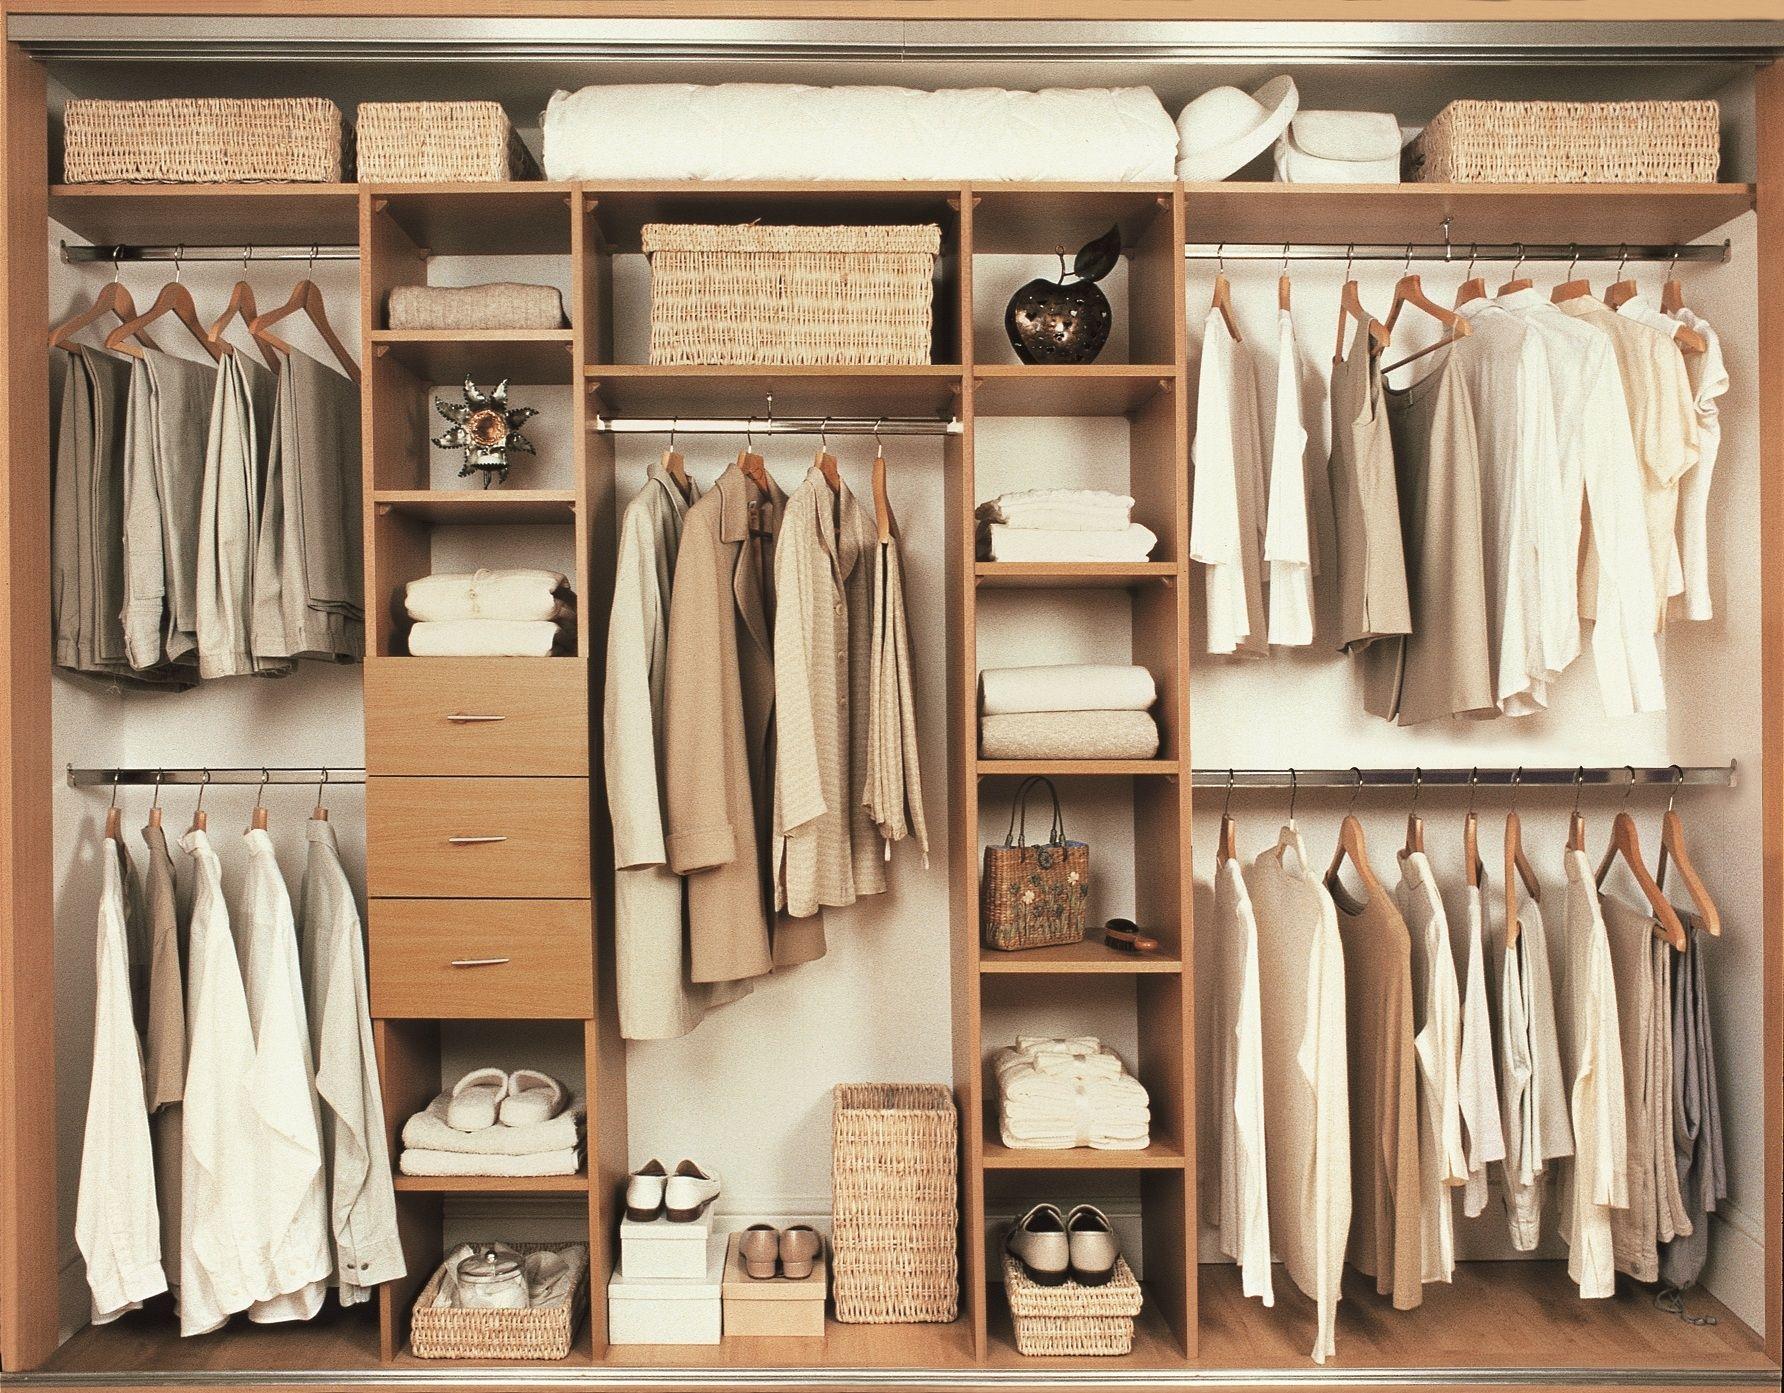 Z Easi Wardrobe Storage Closet 1 784 393 Pixels